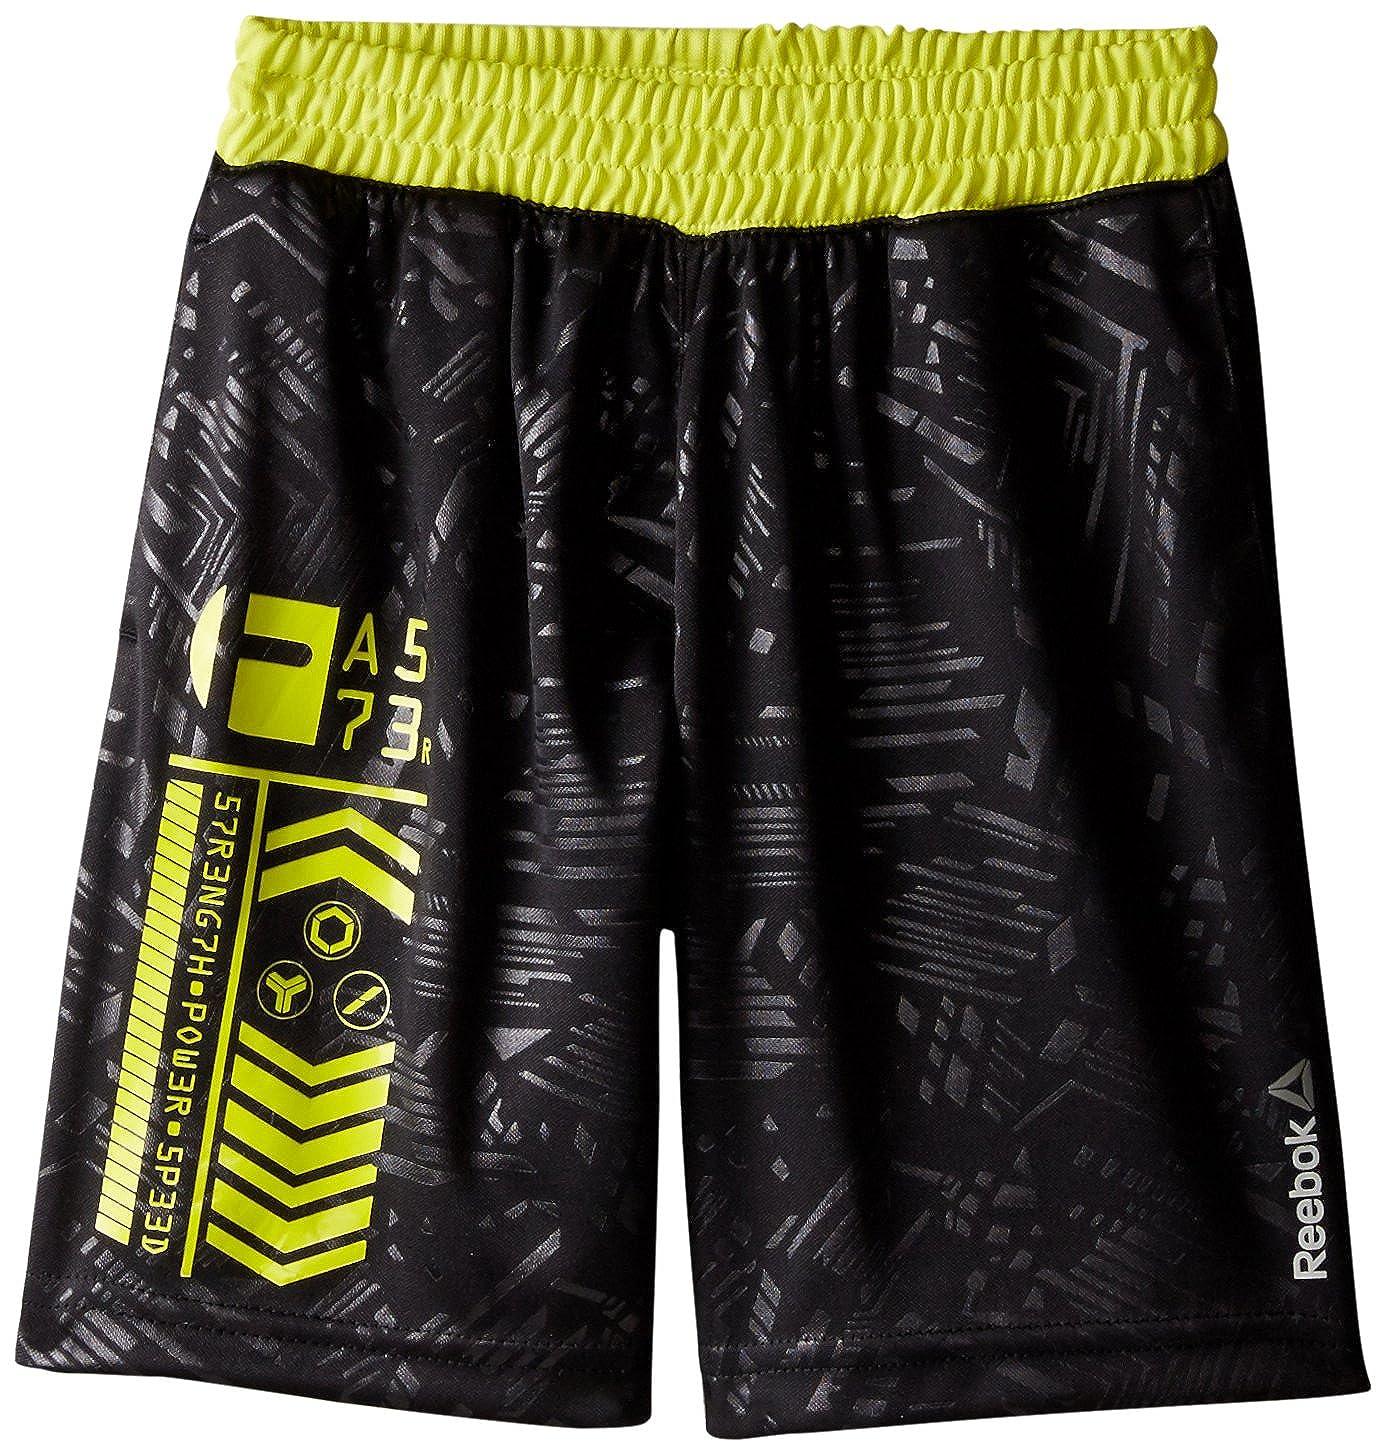 Reebok Little Boys Strength Short Black 7 3054